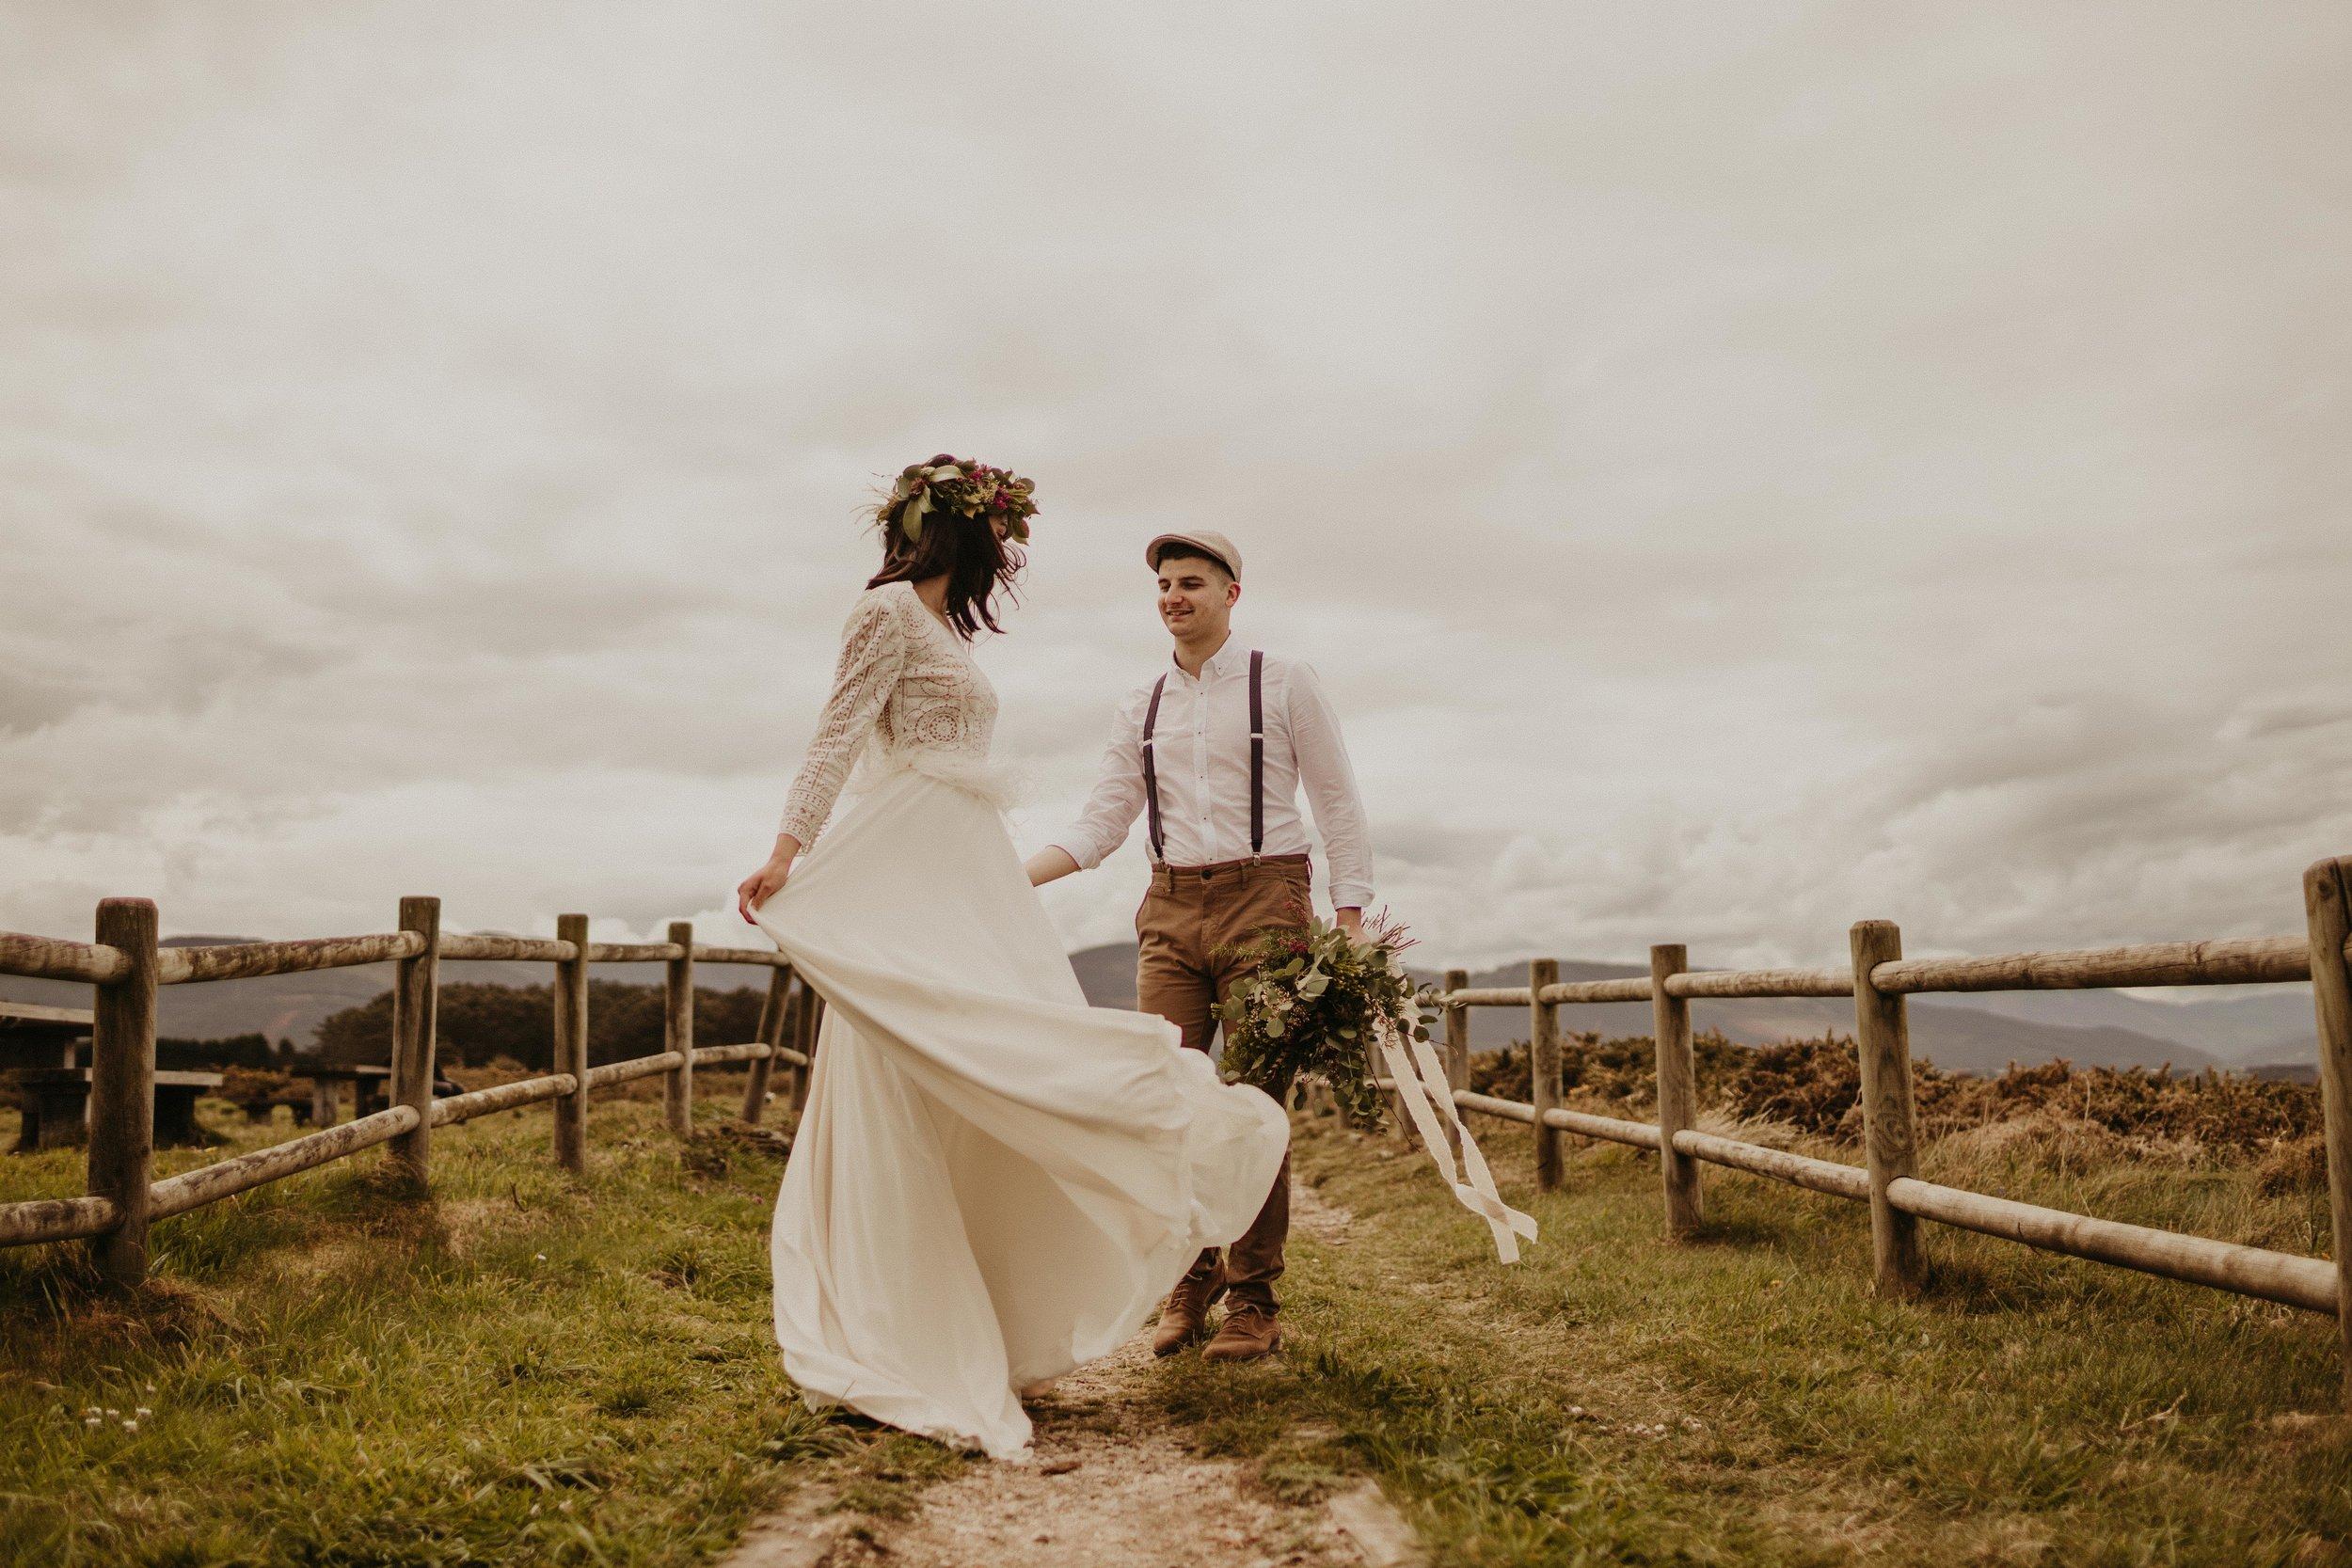 SARA & CRIS - RURAL WEDDING INSPIRATION -